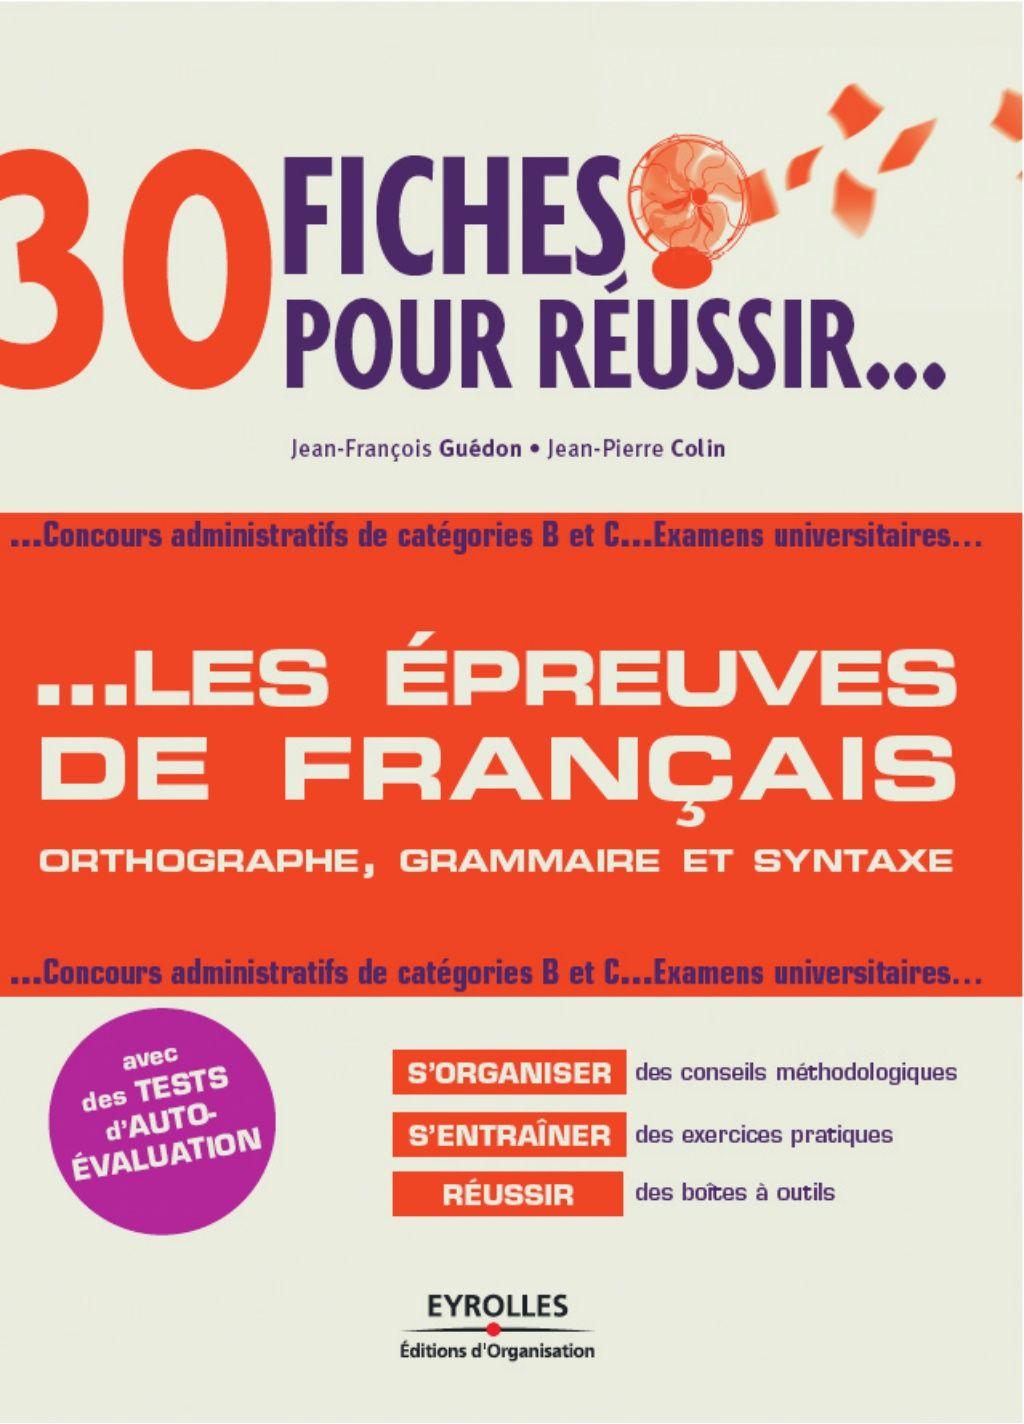 30fichespourfrancais by yassine king via slideshare francais france concours crpe. Black Bedroom Furniture Sets. Home Design Ideas